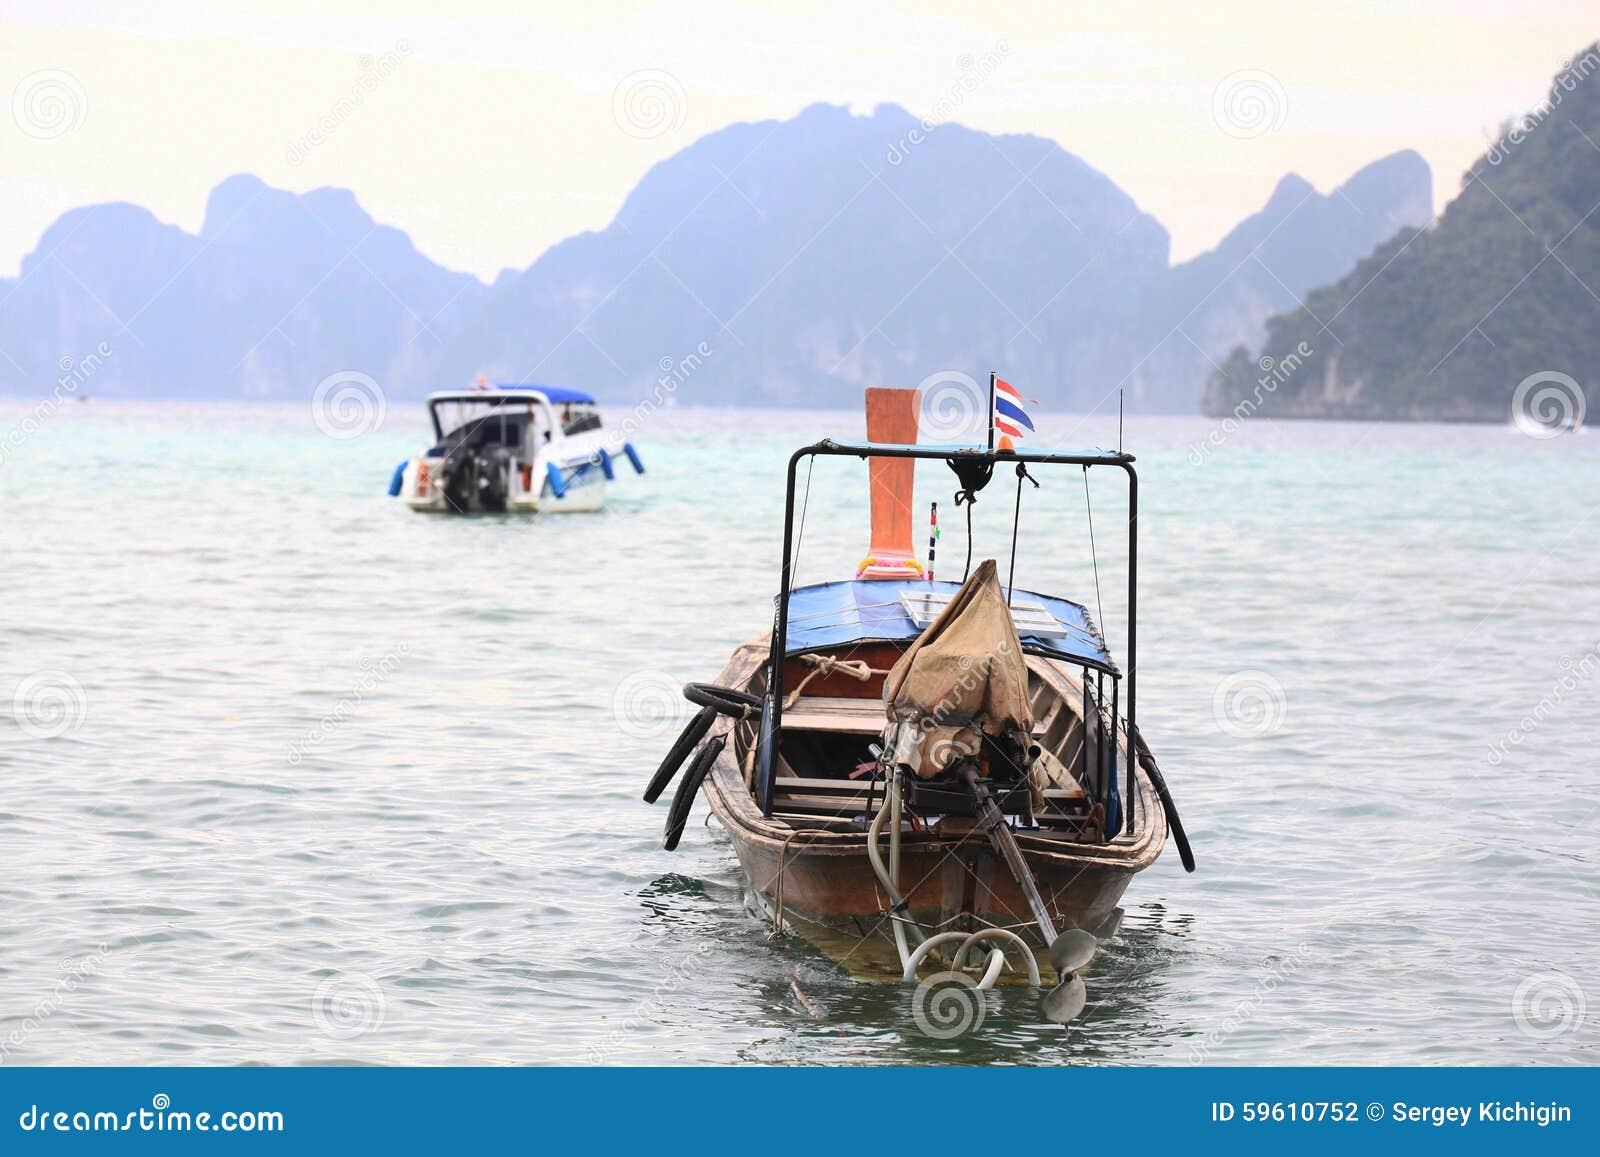 Phuket, THAILAND -JANUARY 05: Landscape Sea Kayak Excursion